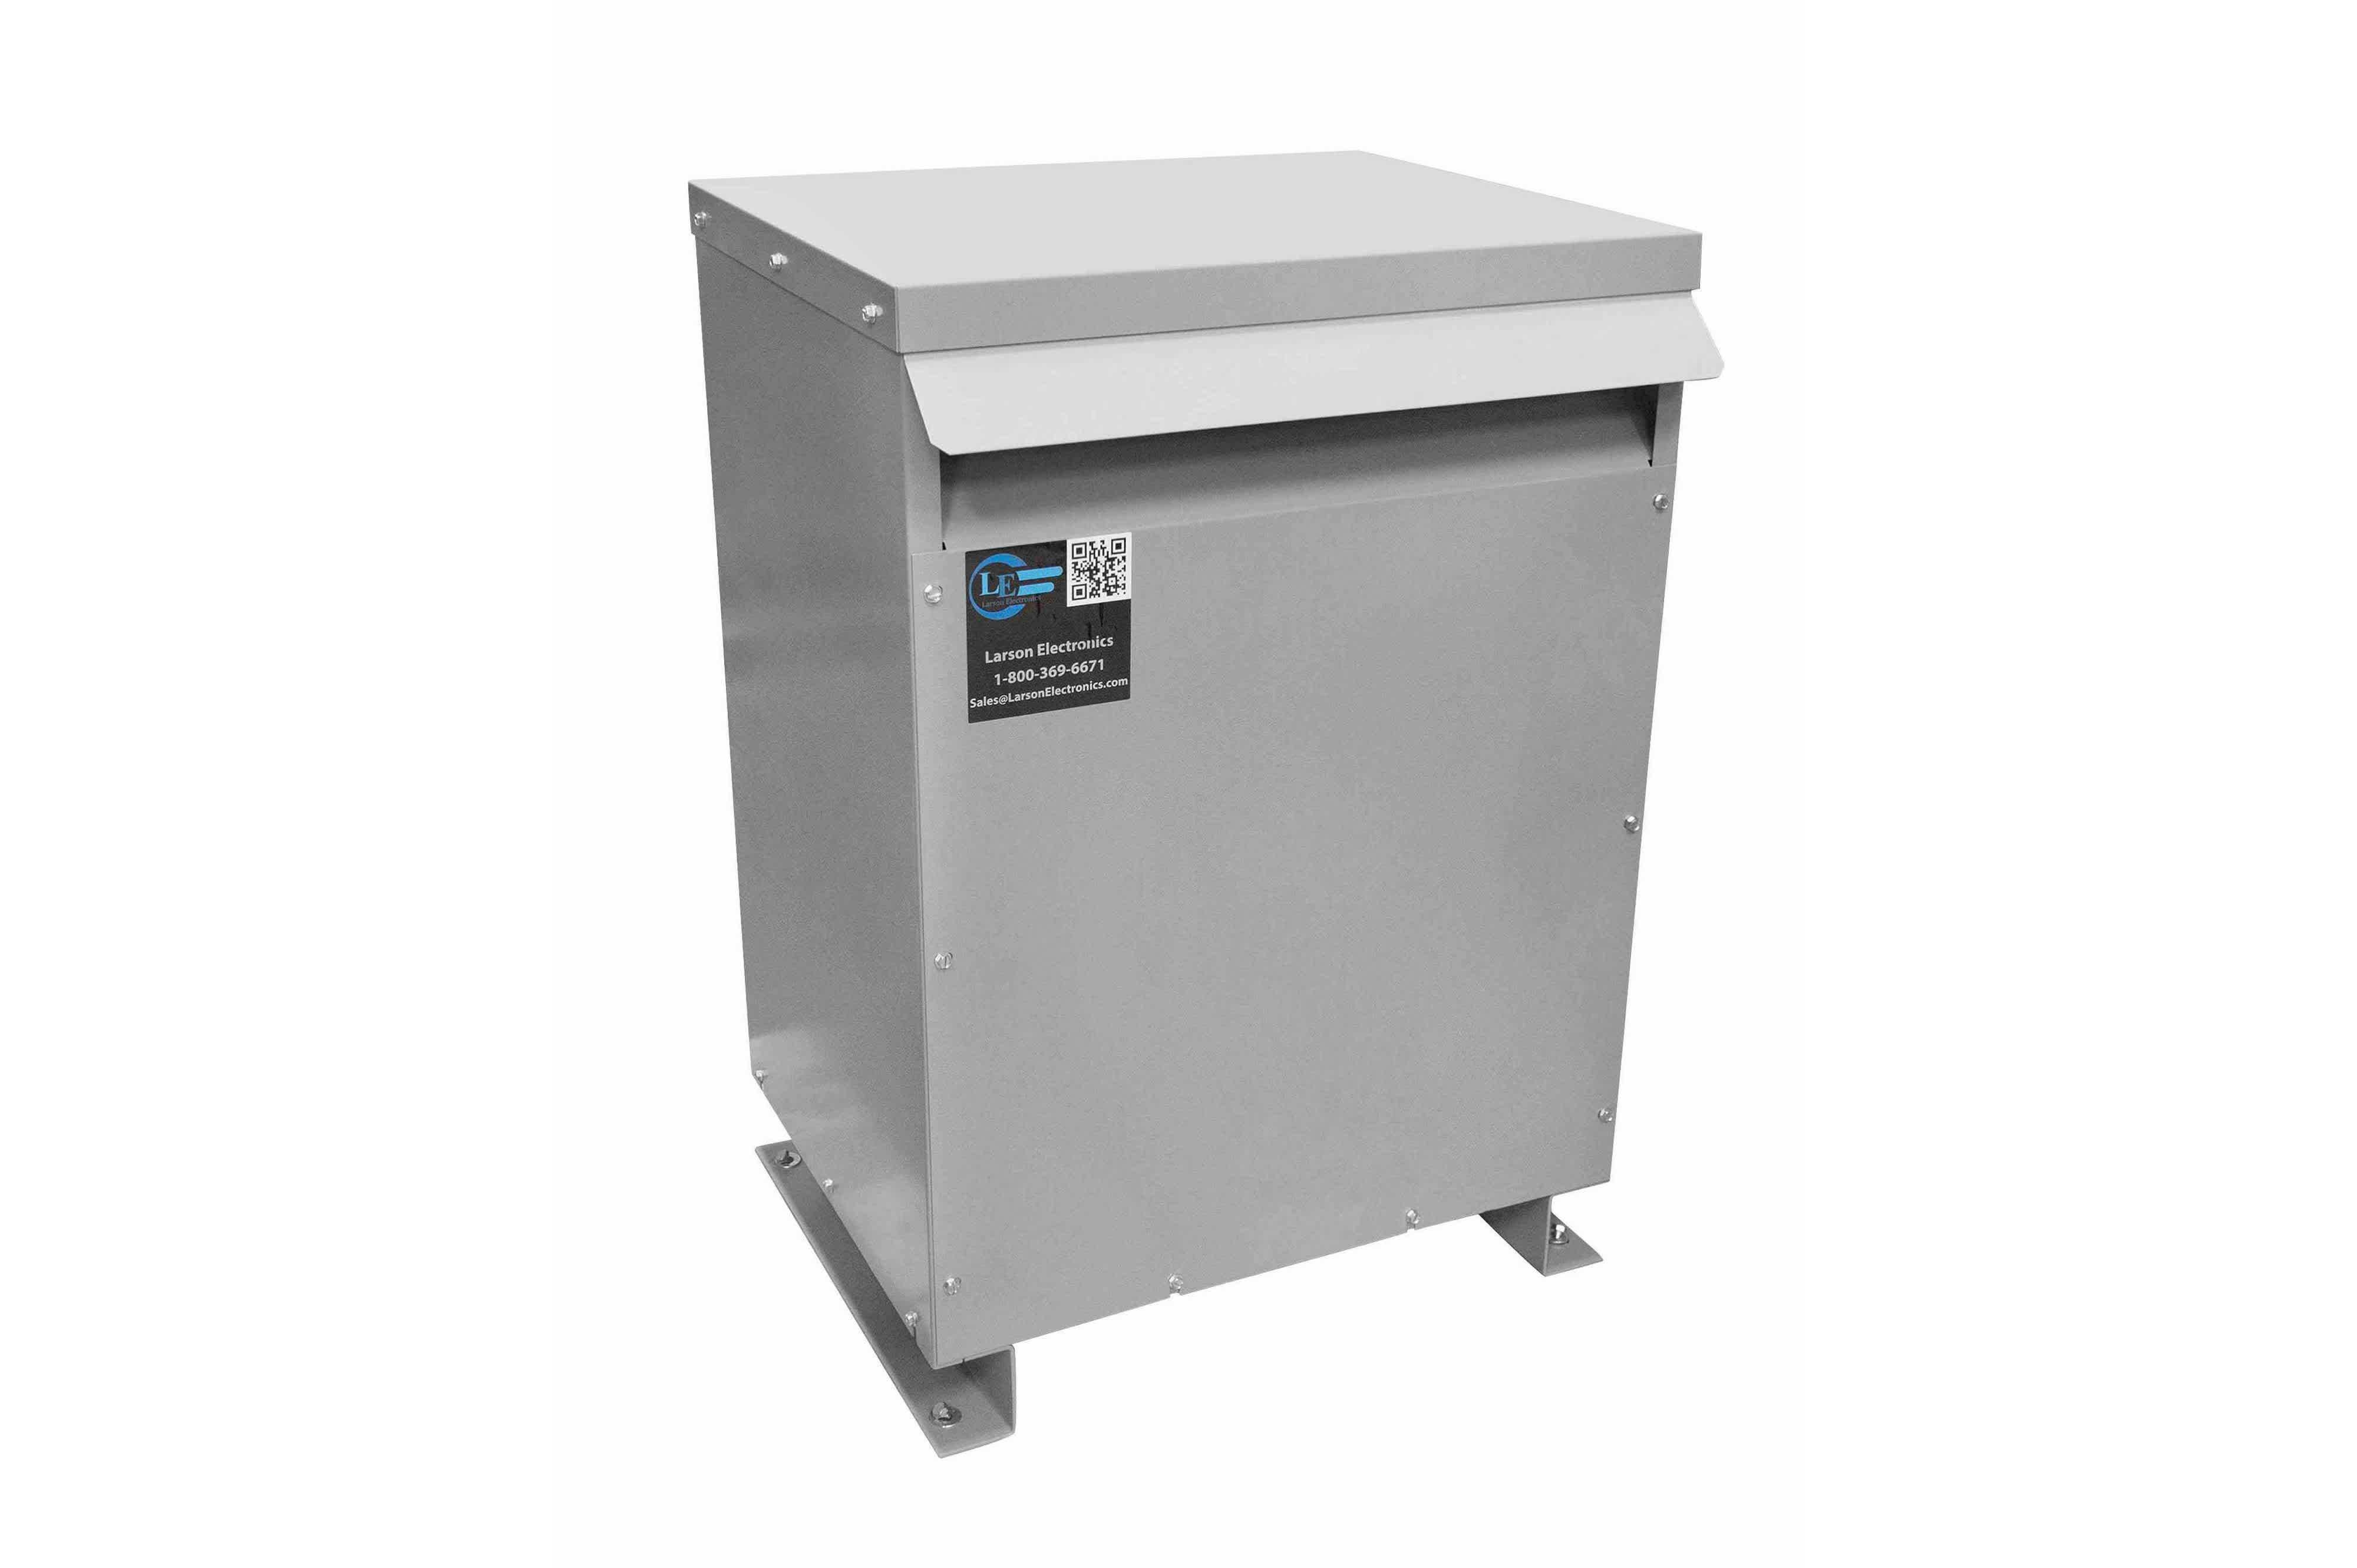 29 kVA 3PH Isolation Transformer, 480V Wye Primary, 575V Delta Secondary, N3R, Ventilated, 60 Hz